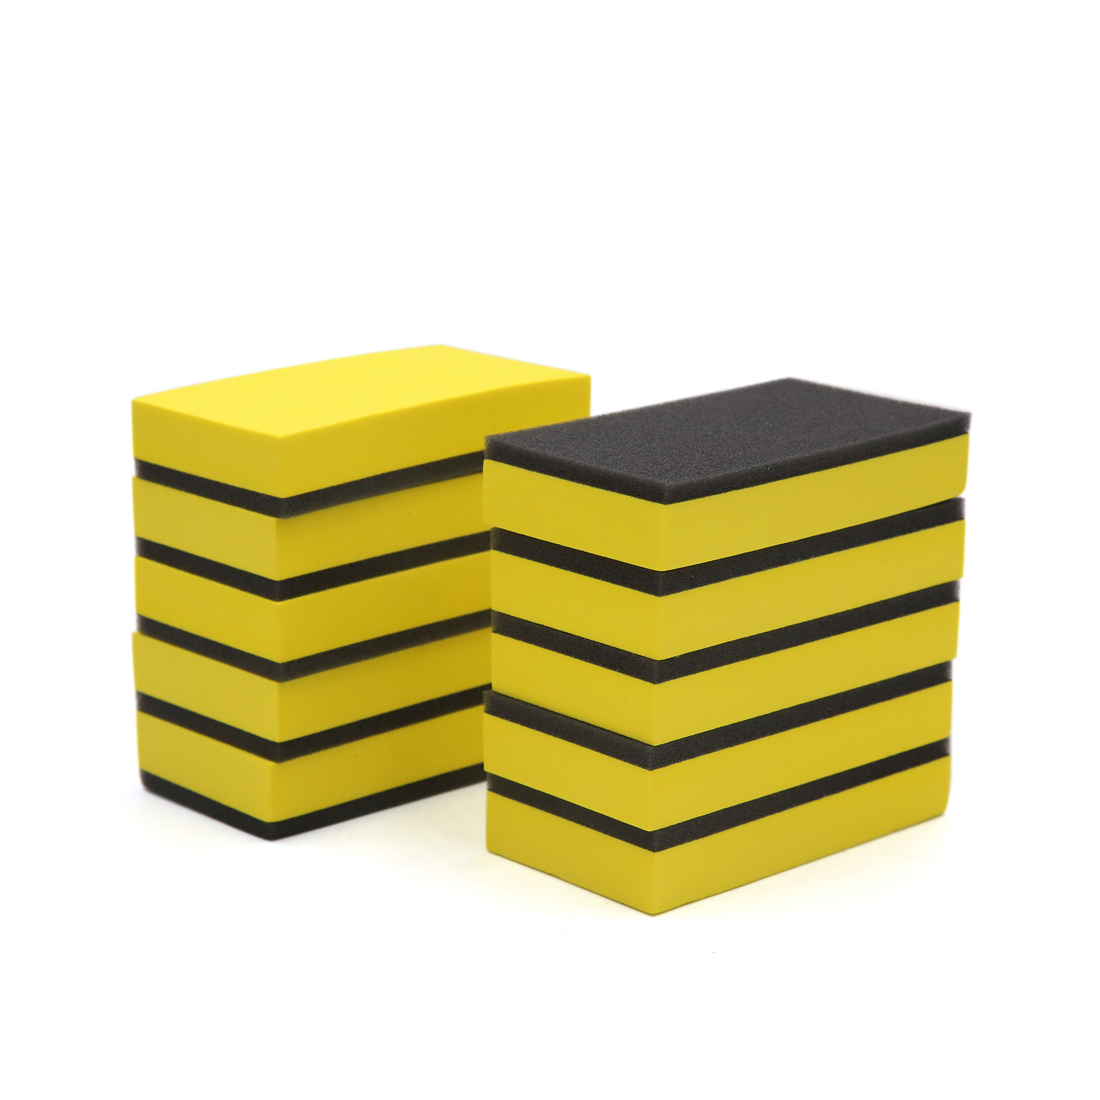 10pcs Yellow Foam Black Sponge Compound EVA Car Waxing Buffing Polishing Pad